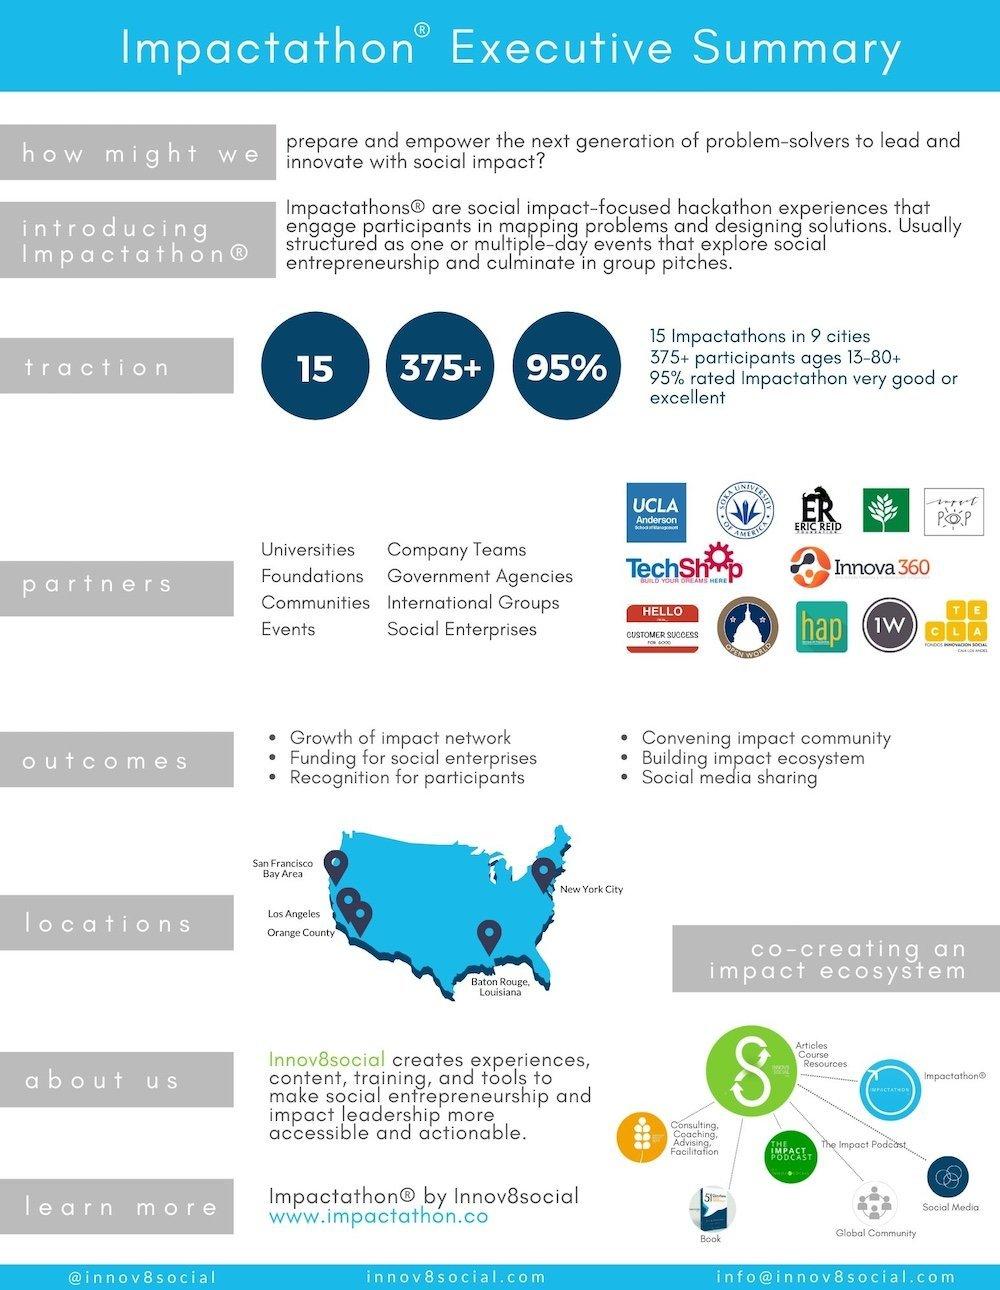 Impactathon 2020 Executive Summary